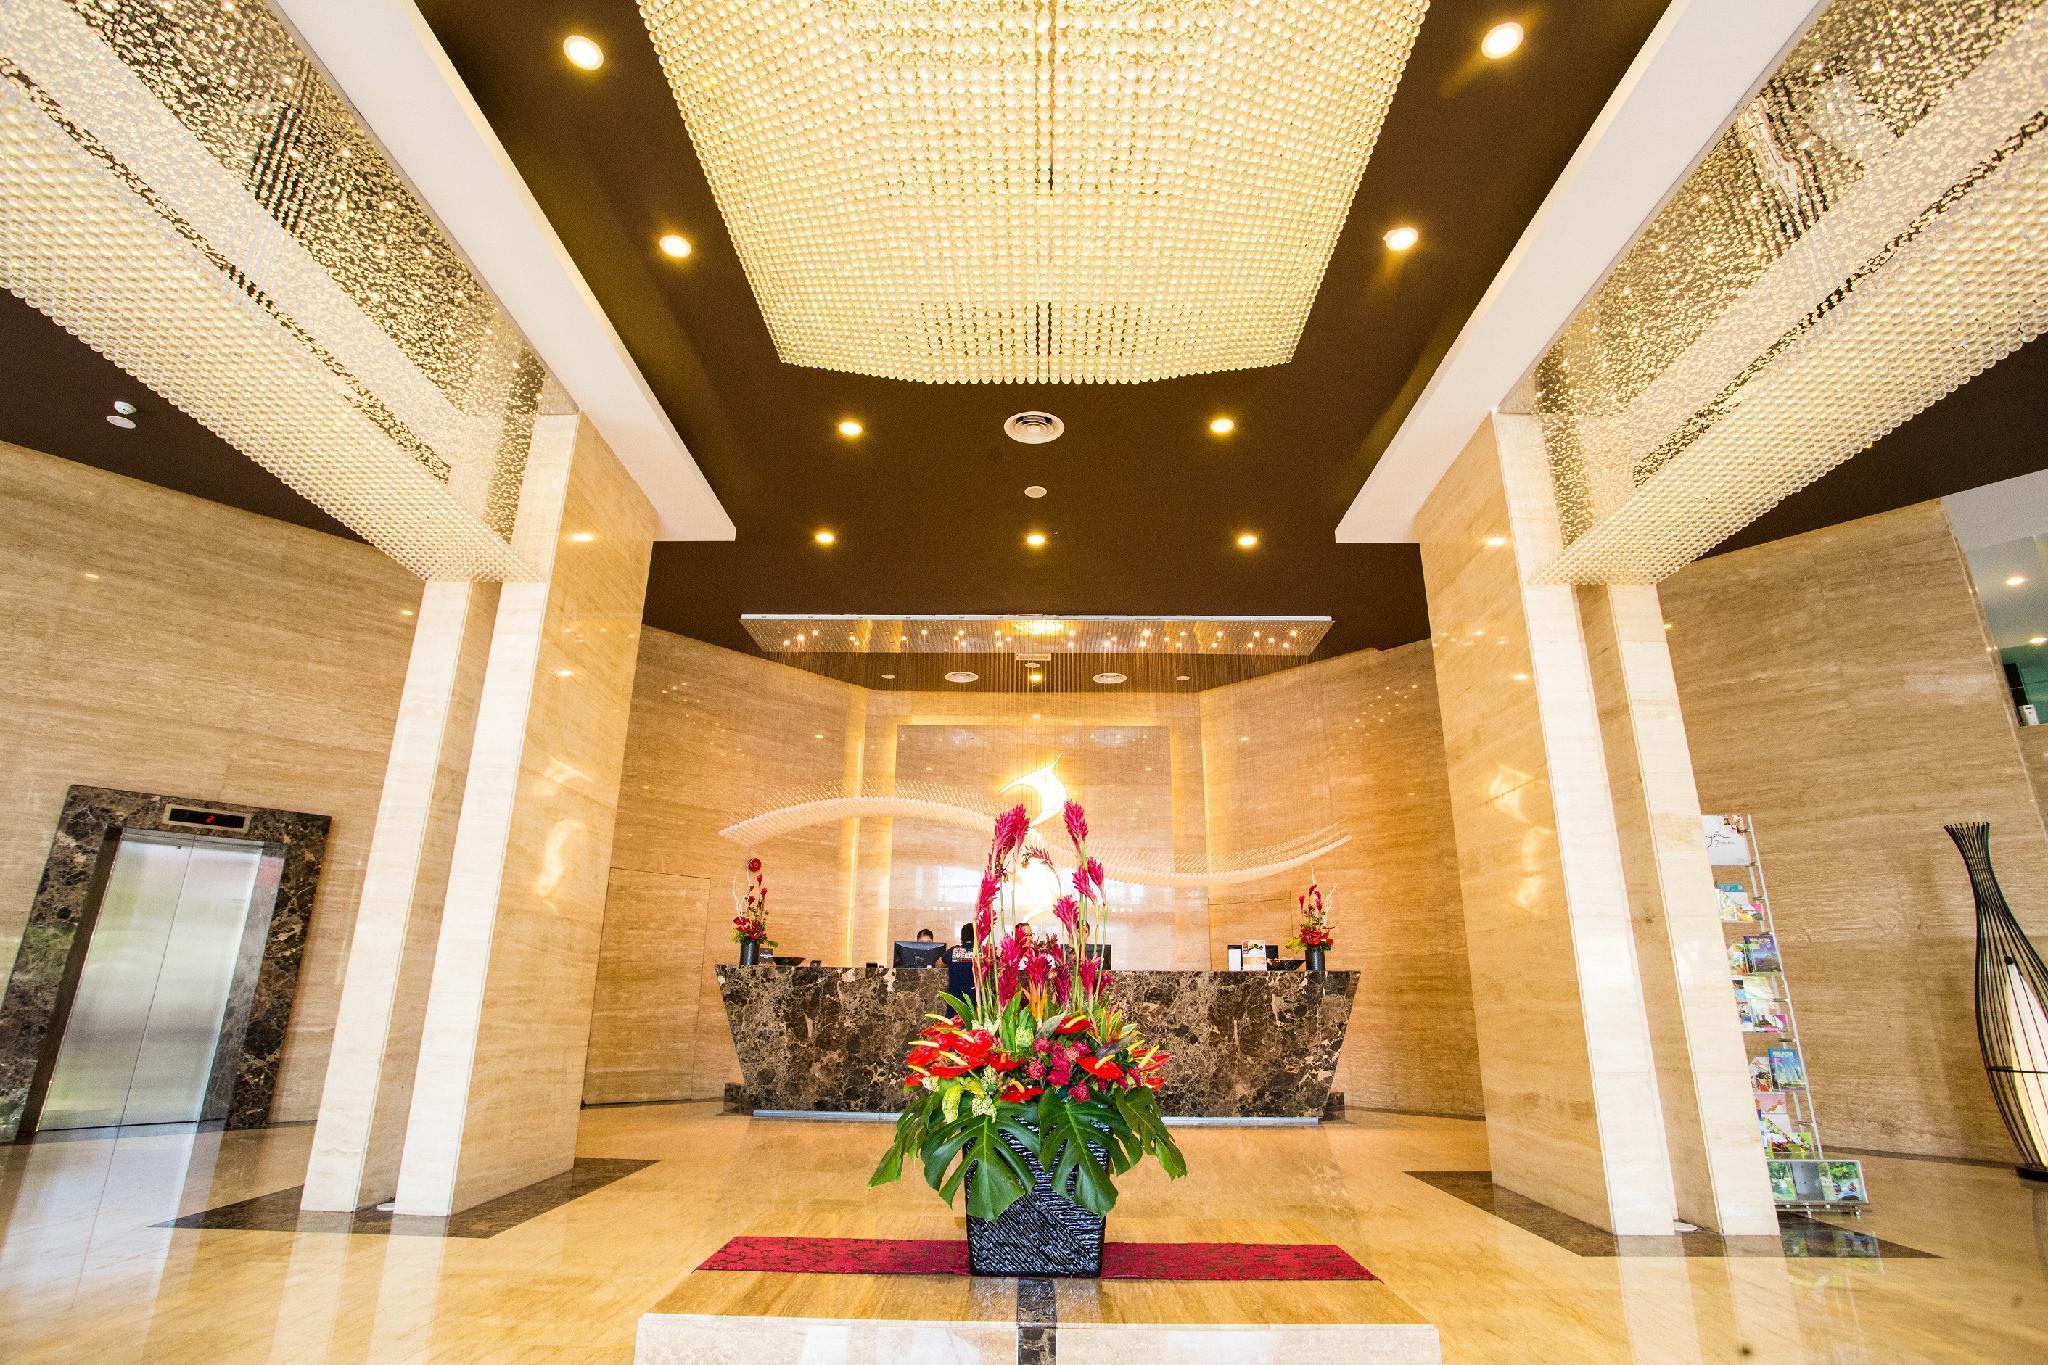 Hotel Royale Signature, Kota Setar